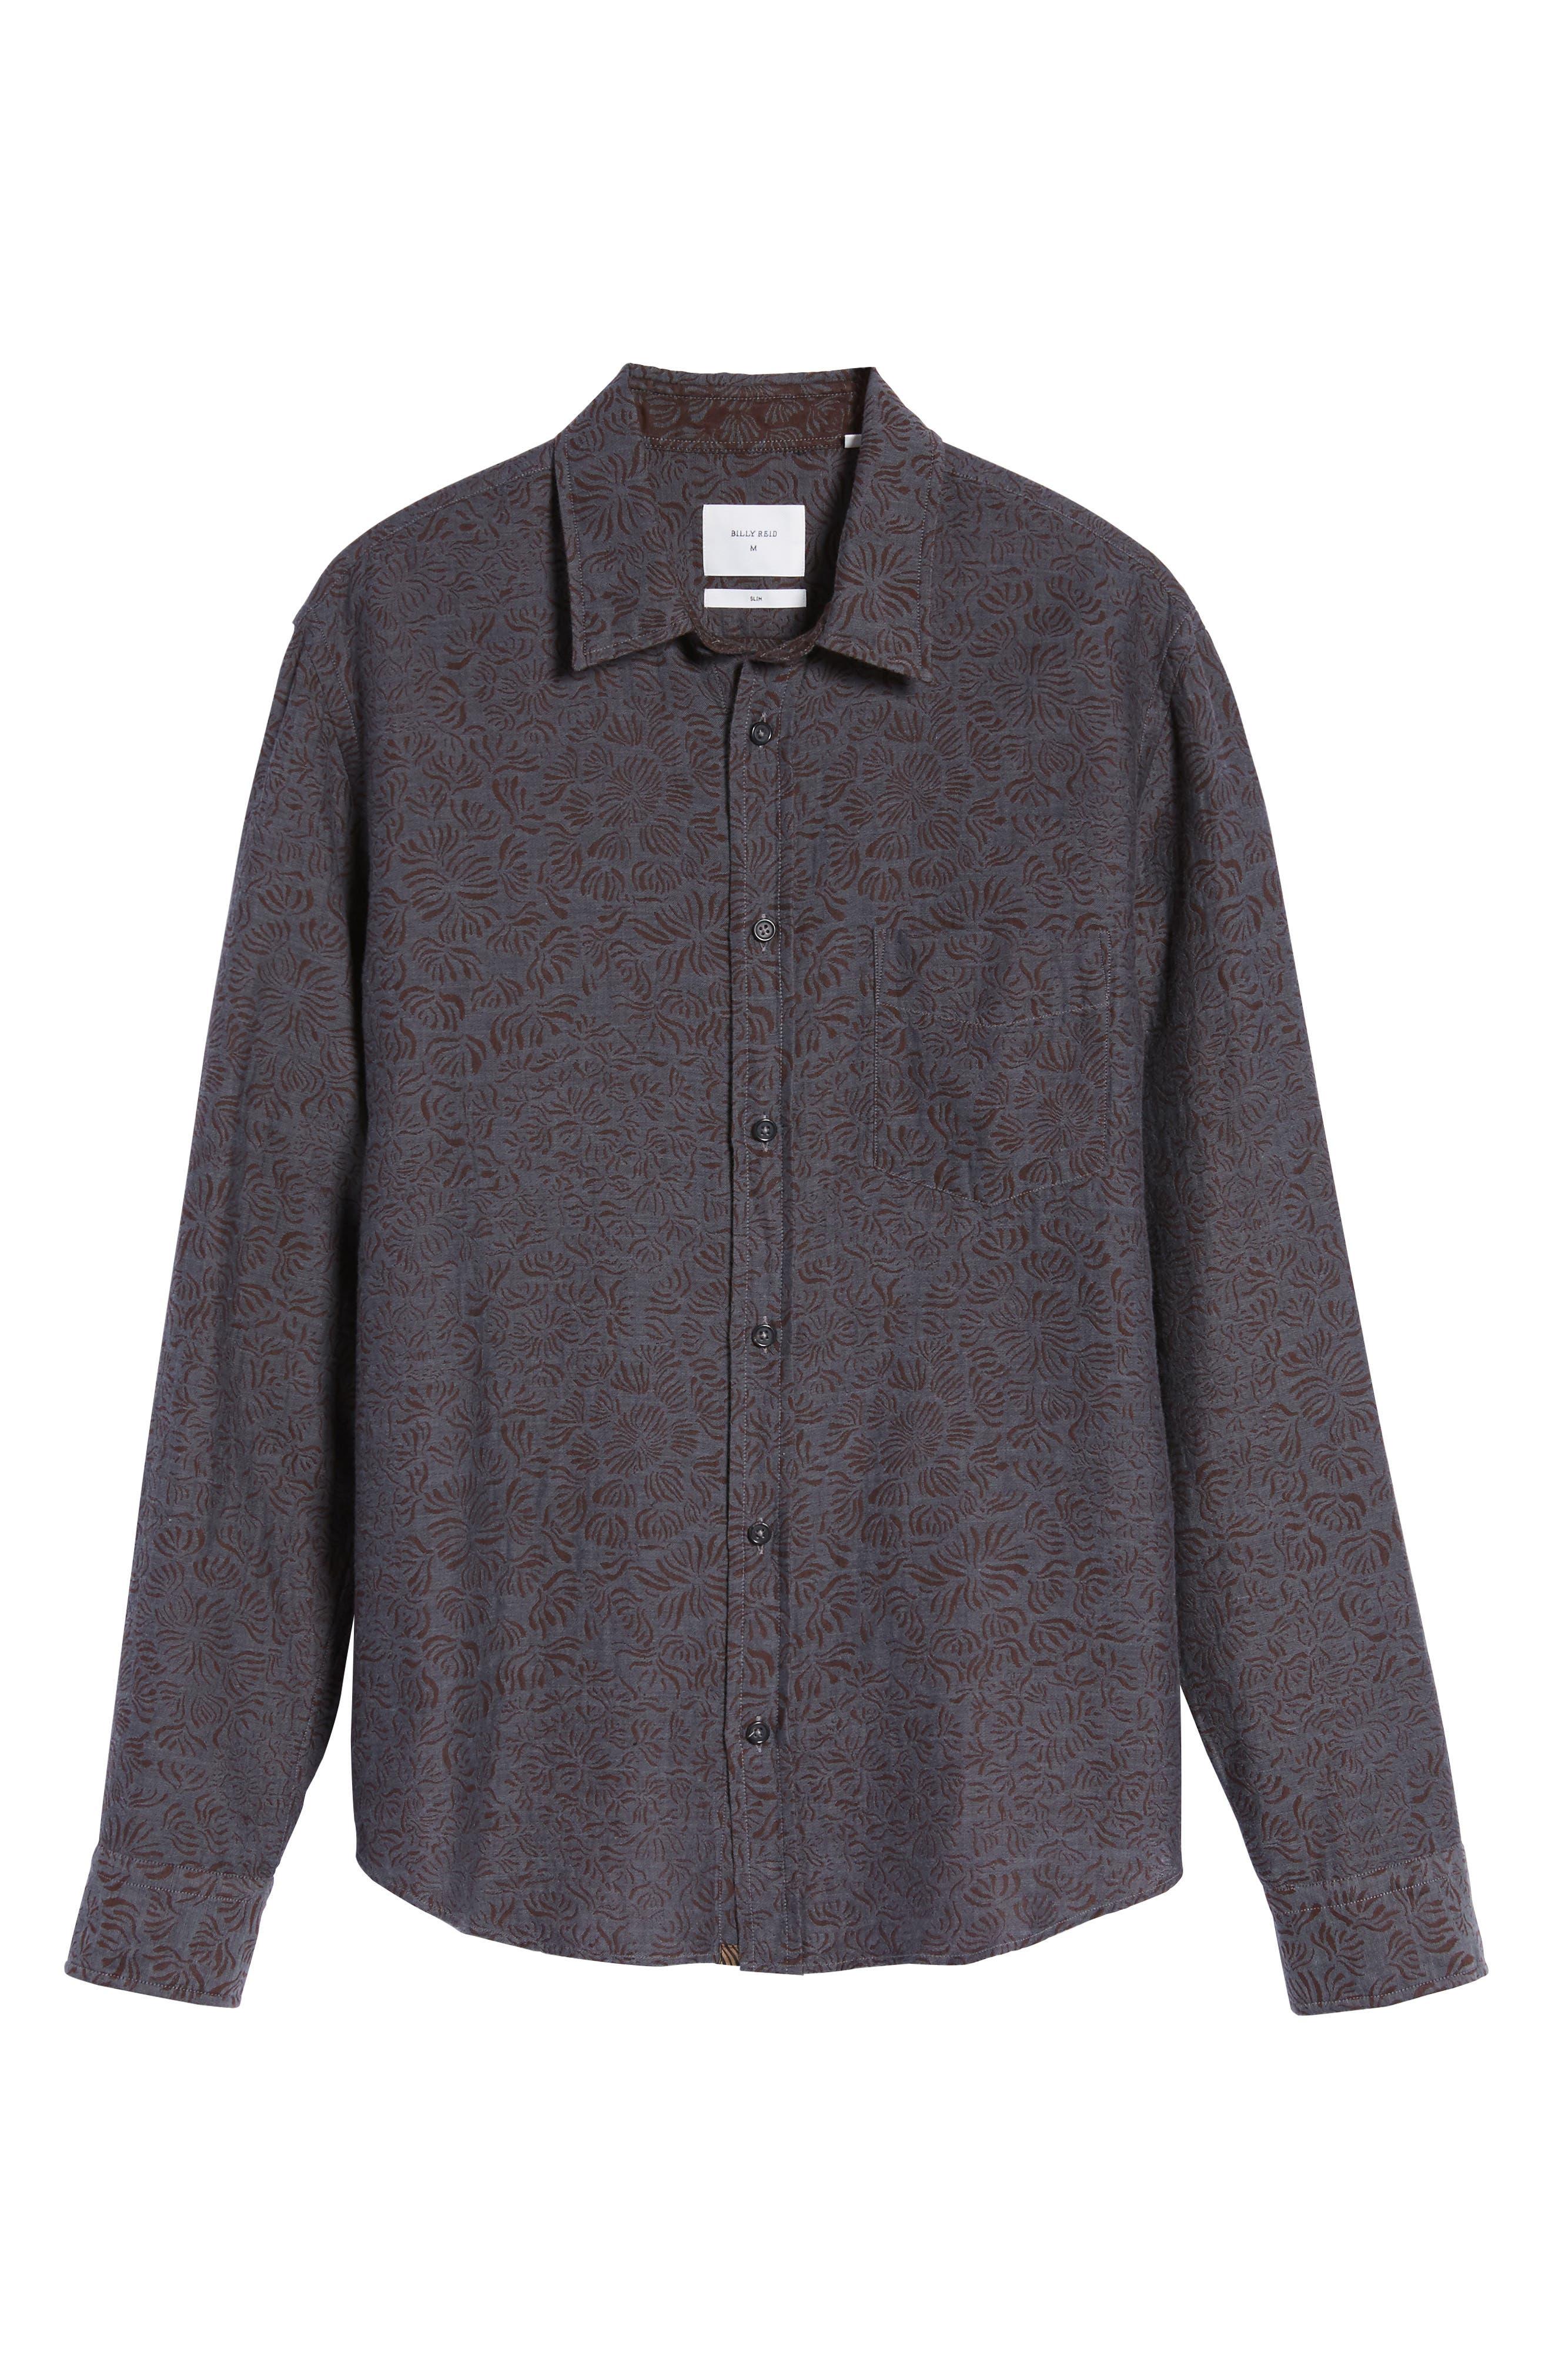 Kirby Slim Fit Jacquard Sport Shirt,                             Alternate thumbnail 6, color,                             Charcoal/ Burgundy